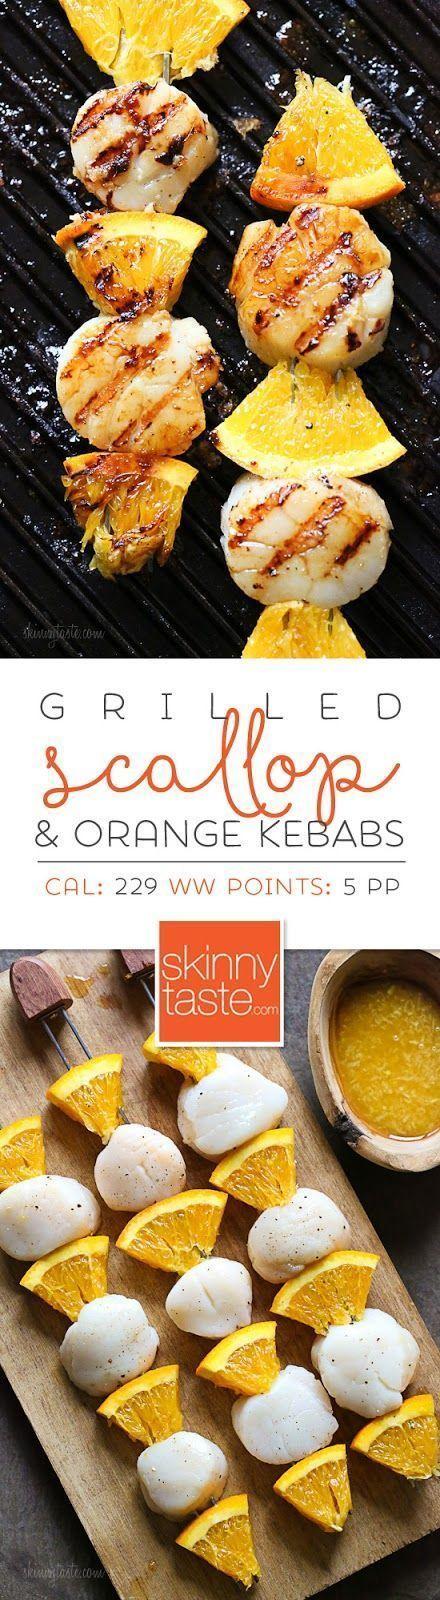 how to cook amazing scallops